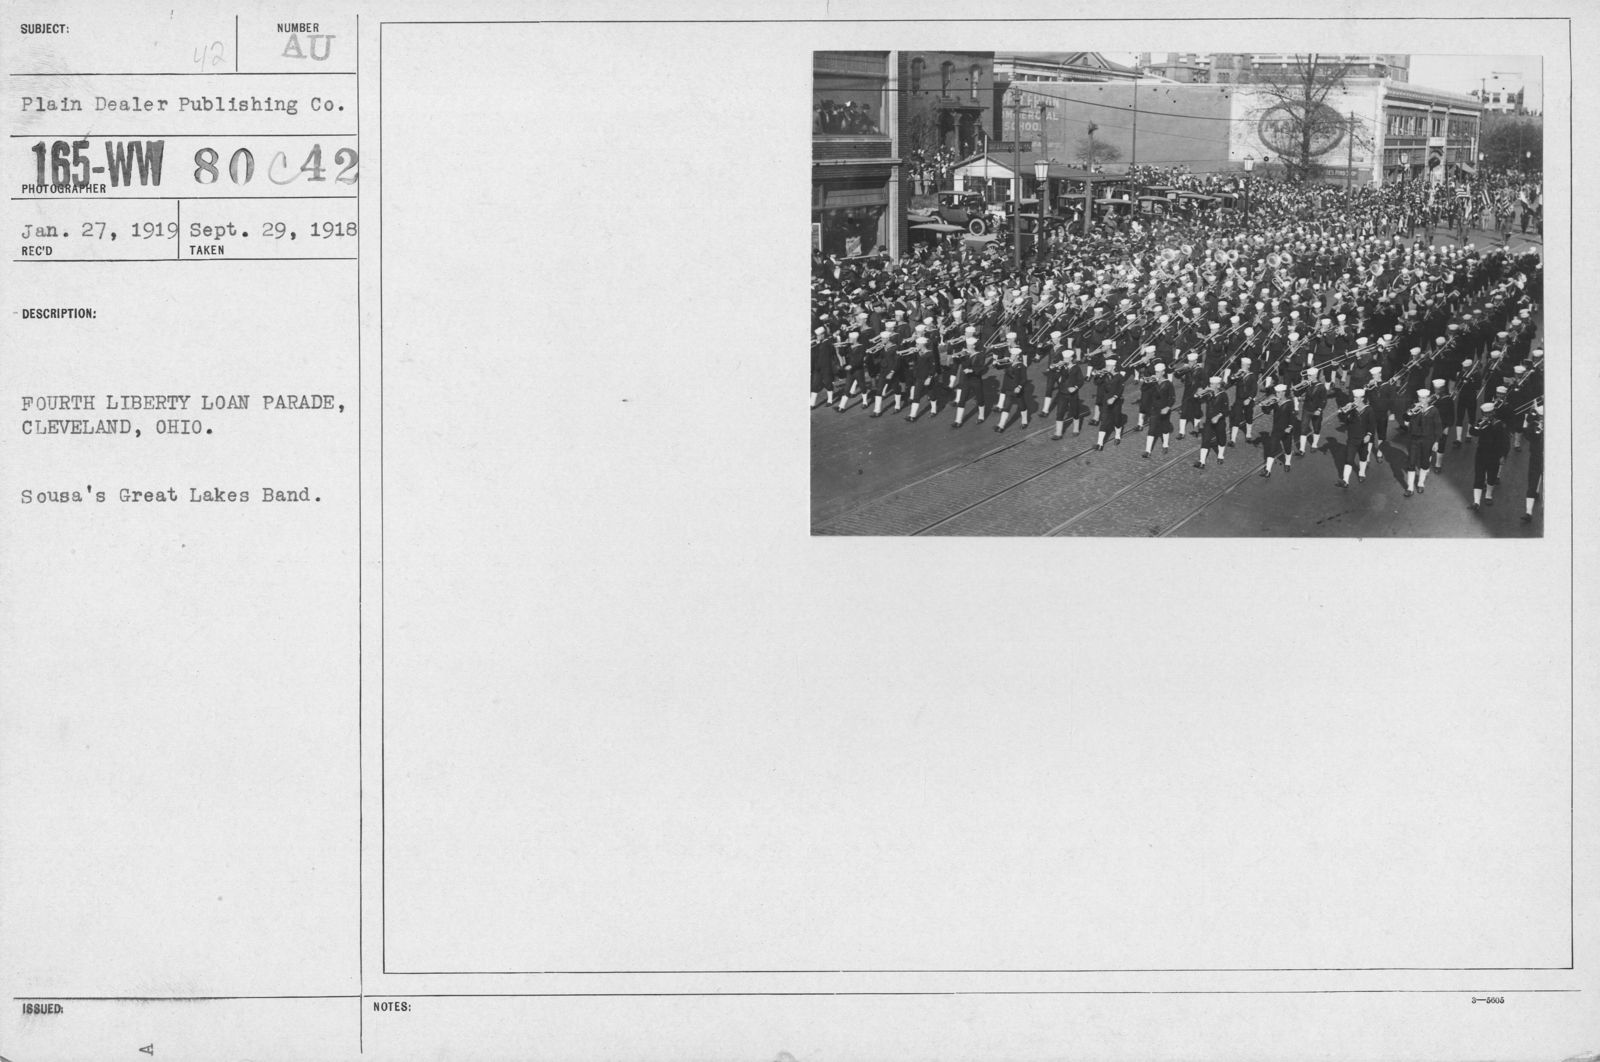 Ceremonies - Liberty Loans (War Finance Parade) - Fourth Liberty Loan Parade, Cleveland, Ohio. Sousa's Great Lakes Band